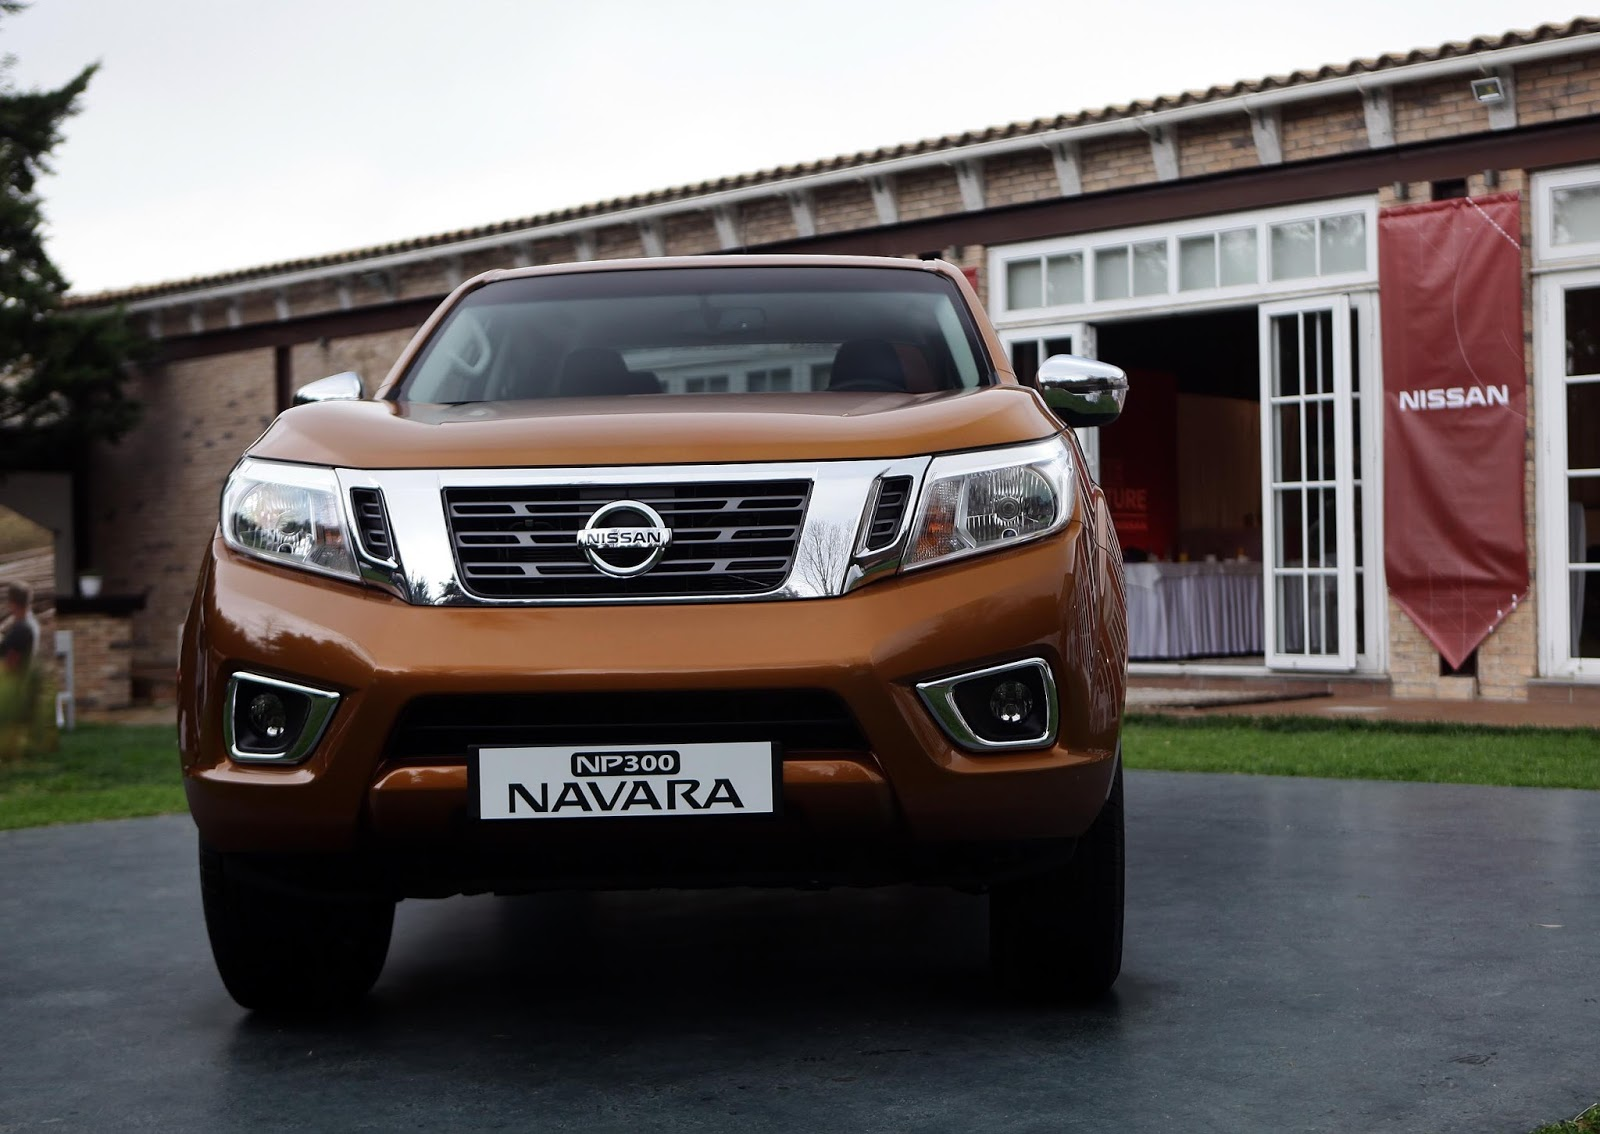 IMG 7469 Το νέο Nissan NP300 NAVARA ήρθε στη χώρα μας για σκληρή δουλειά και από 26.090€ Nissan, Nissan NP300 Navara, Pick-up